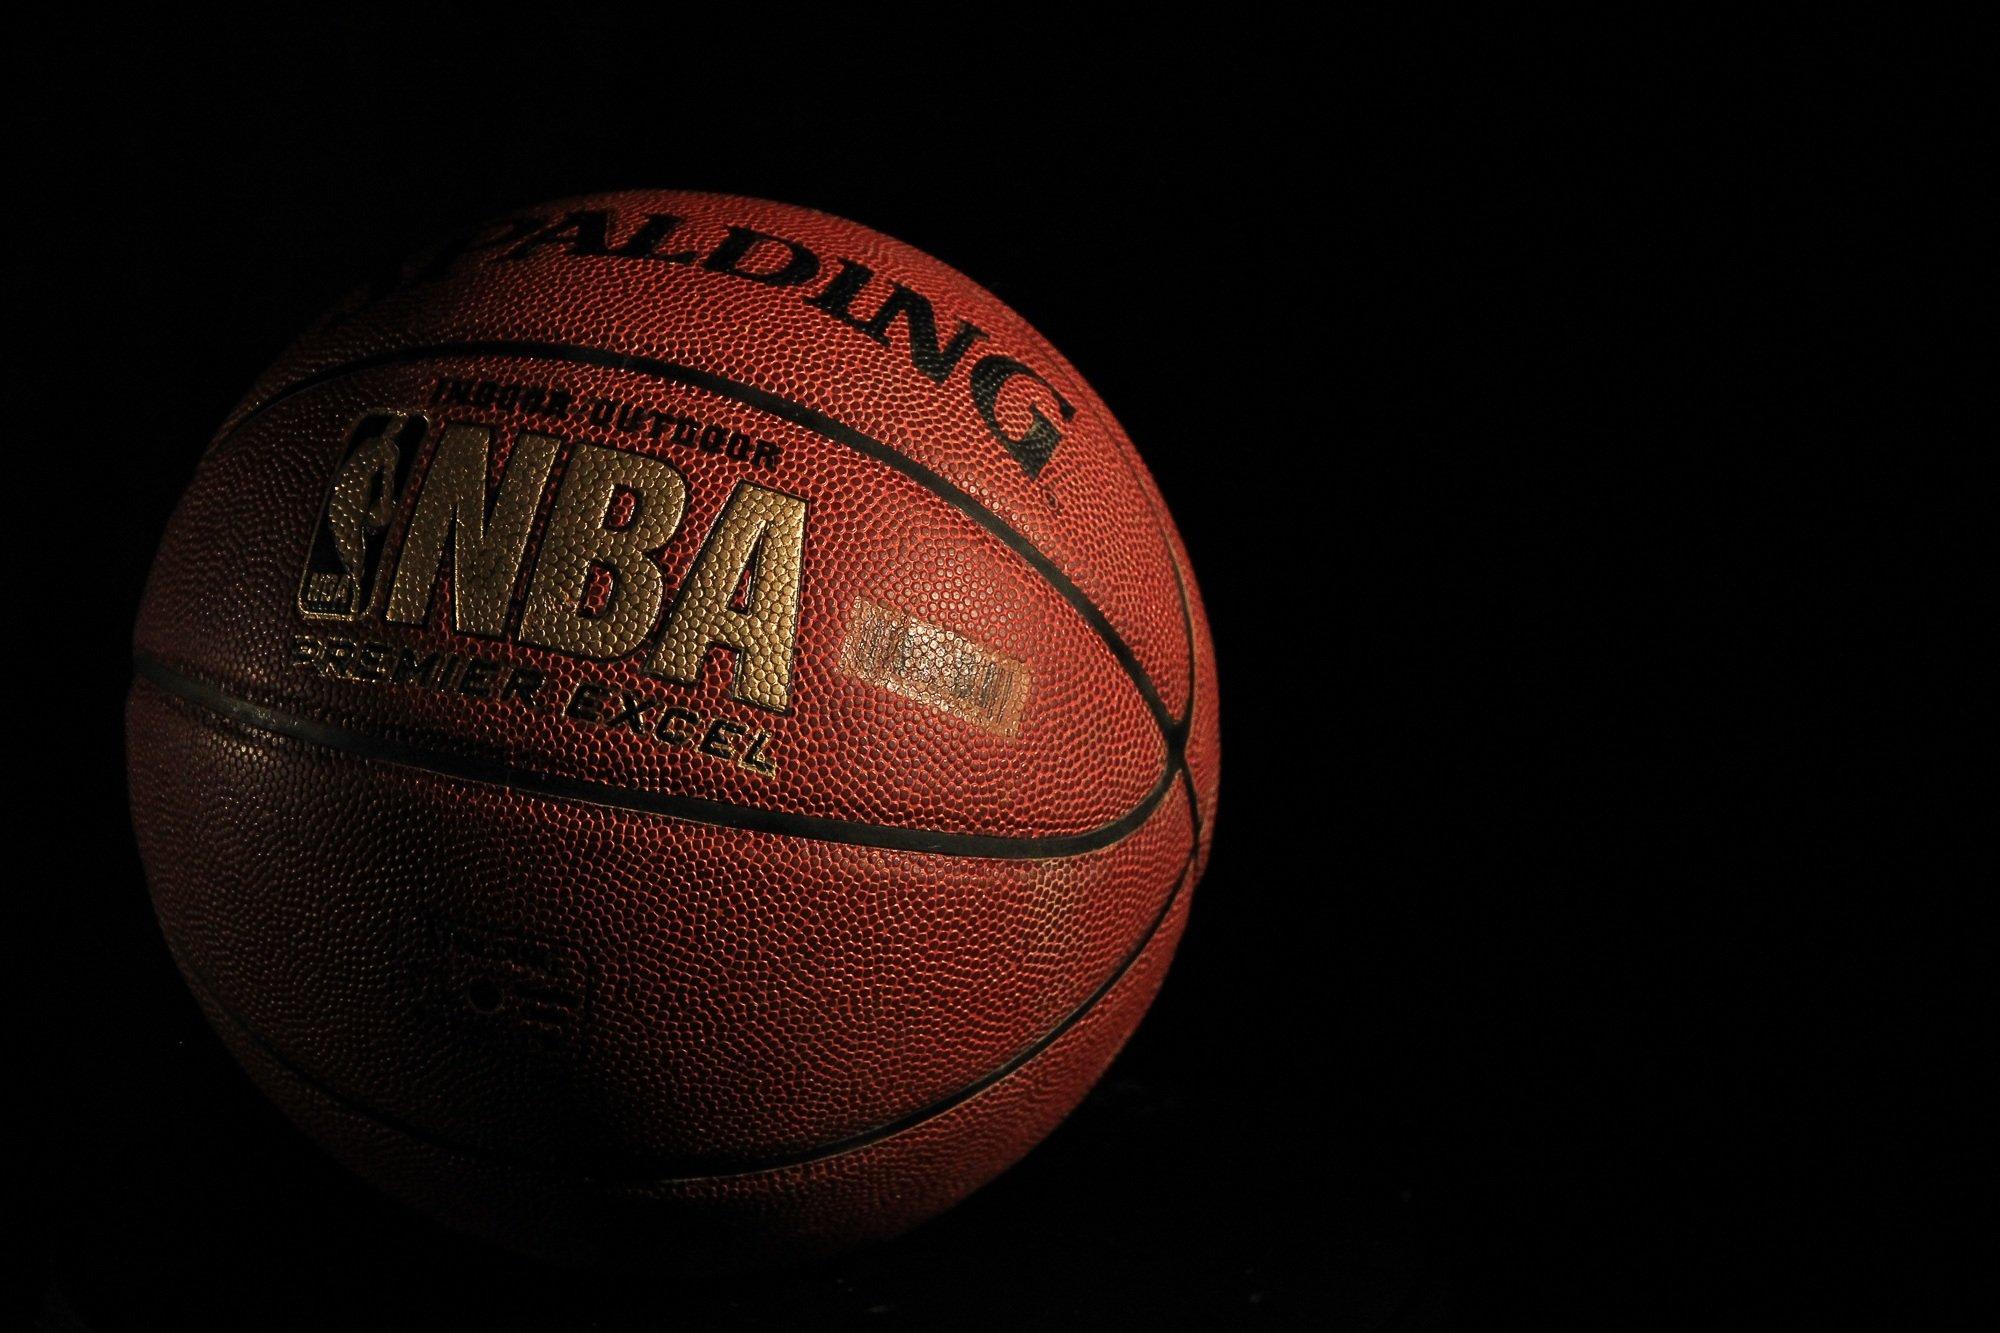 https://pixabay.com/de/photos/basketball-spalding-ball-sport-933173/